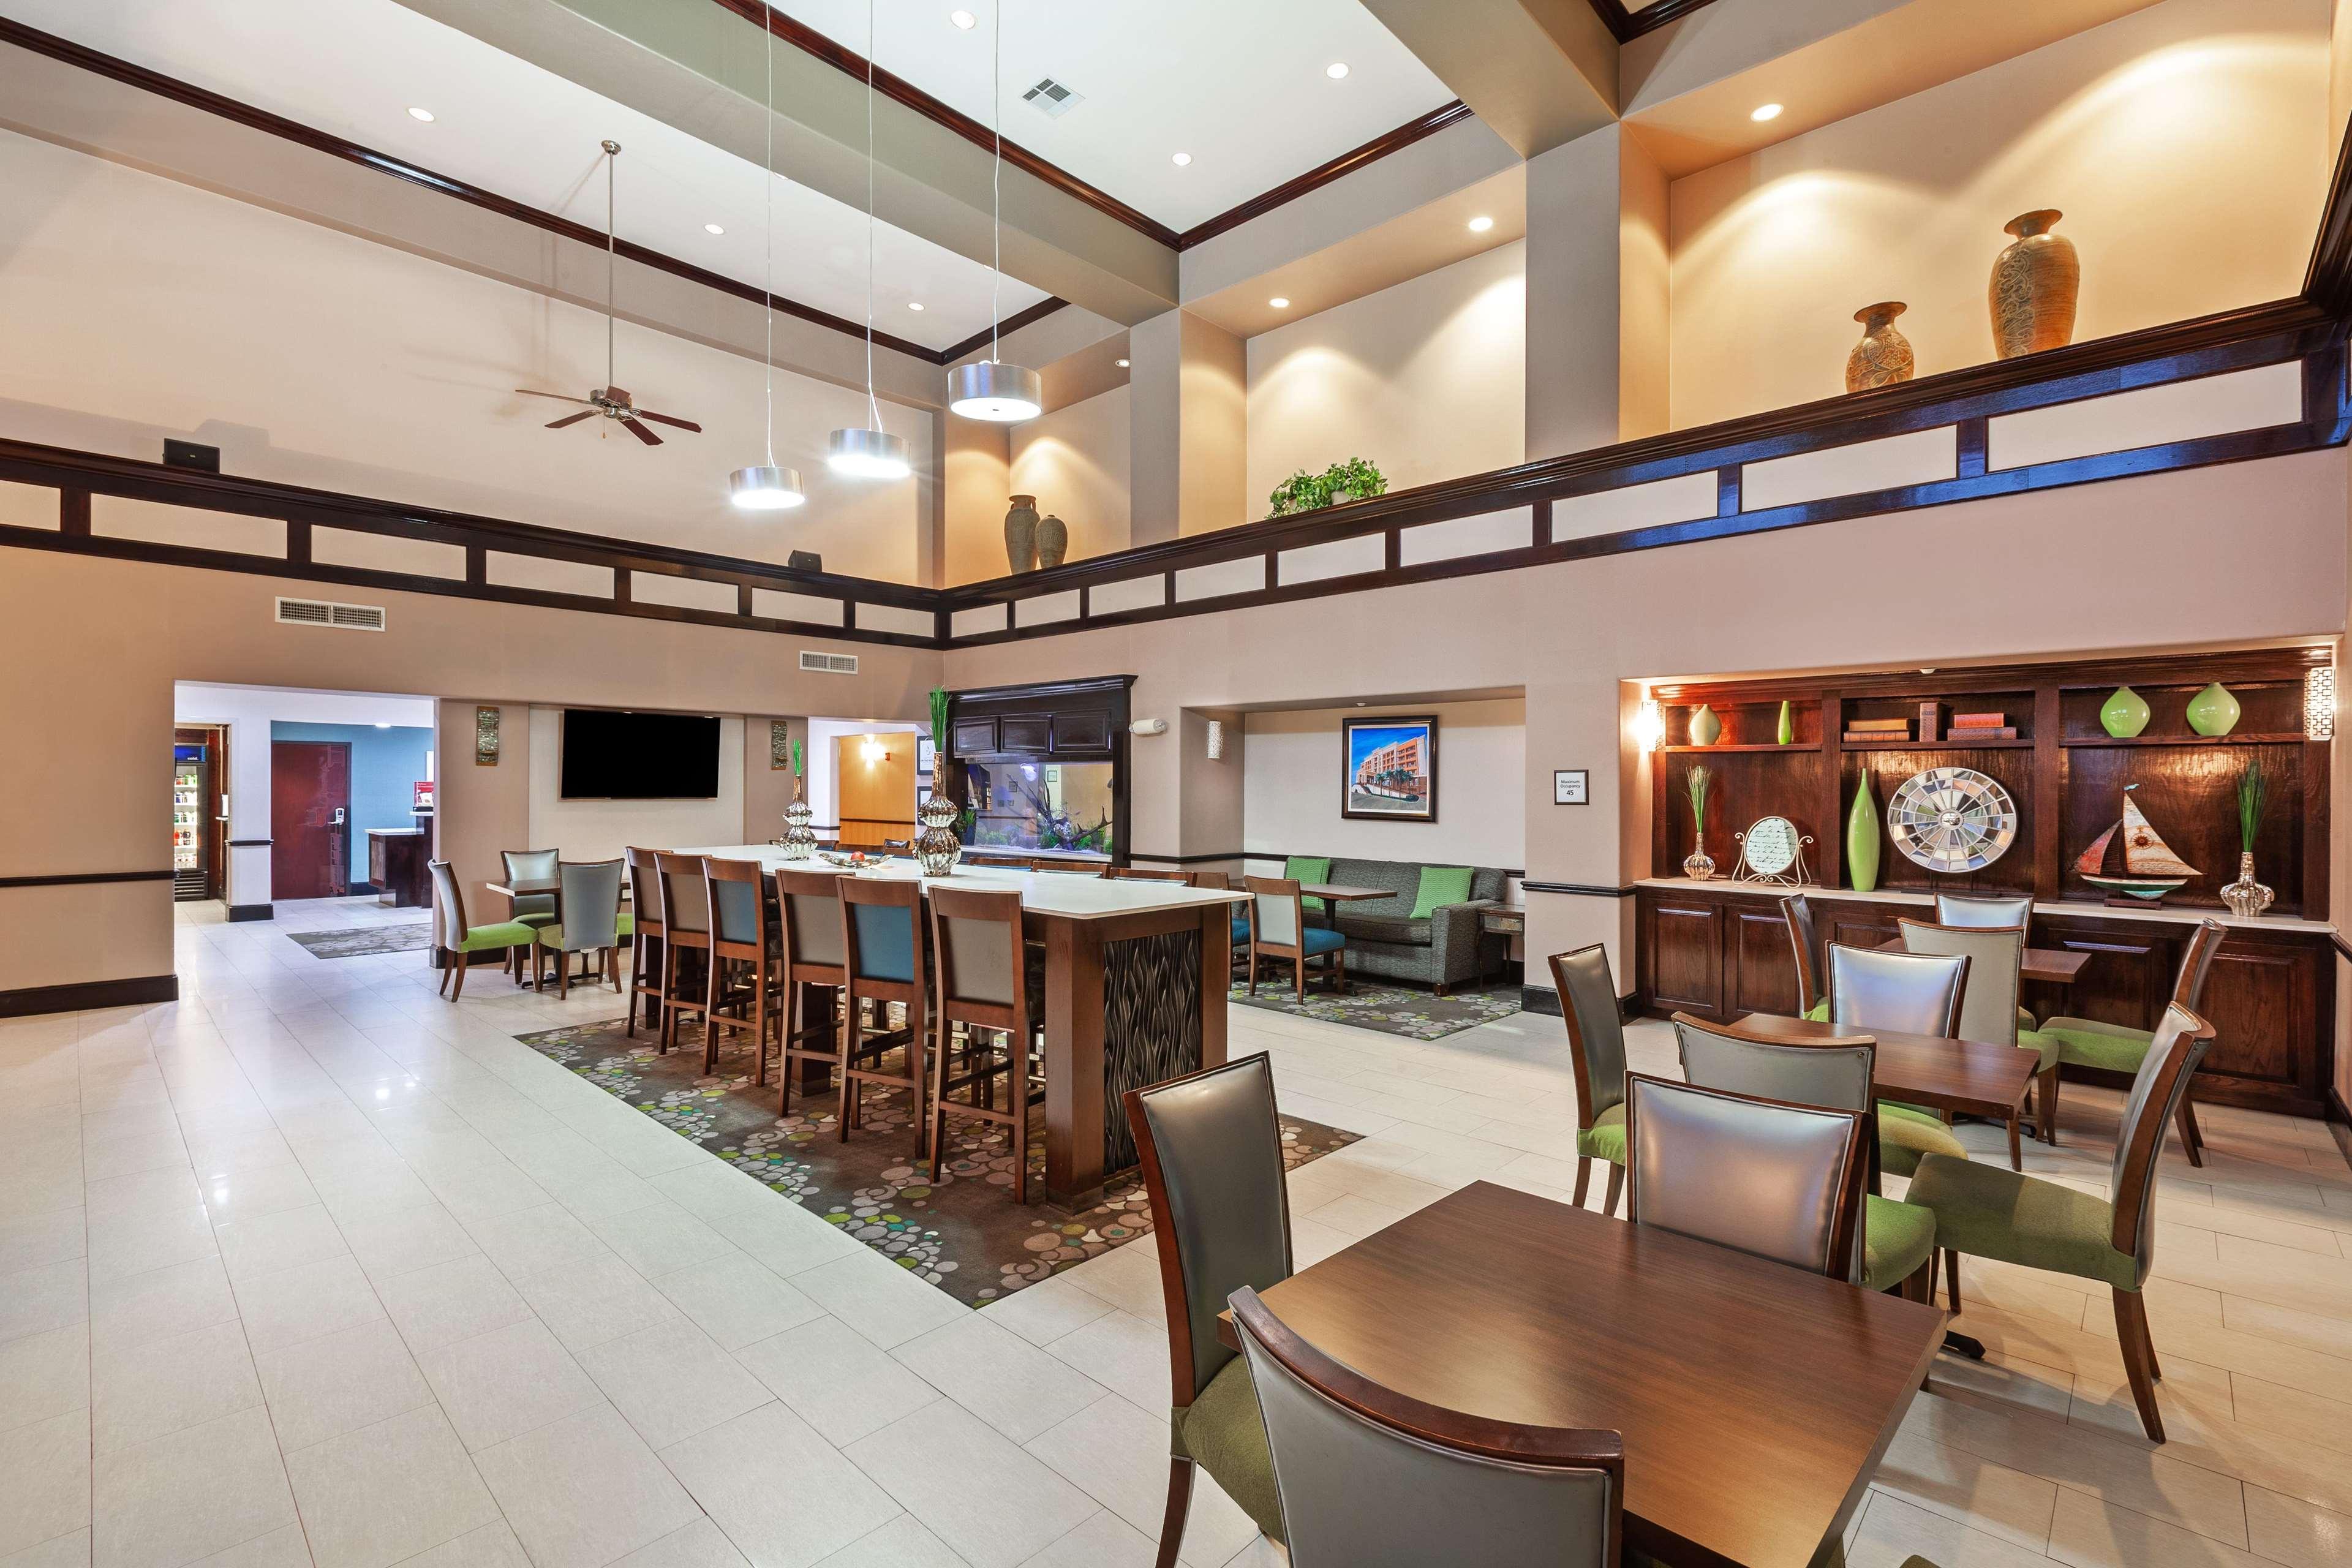 Hampton Inn & Suites Galveston image 12